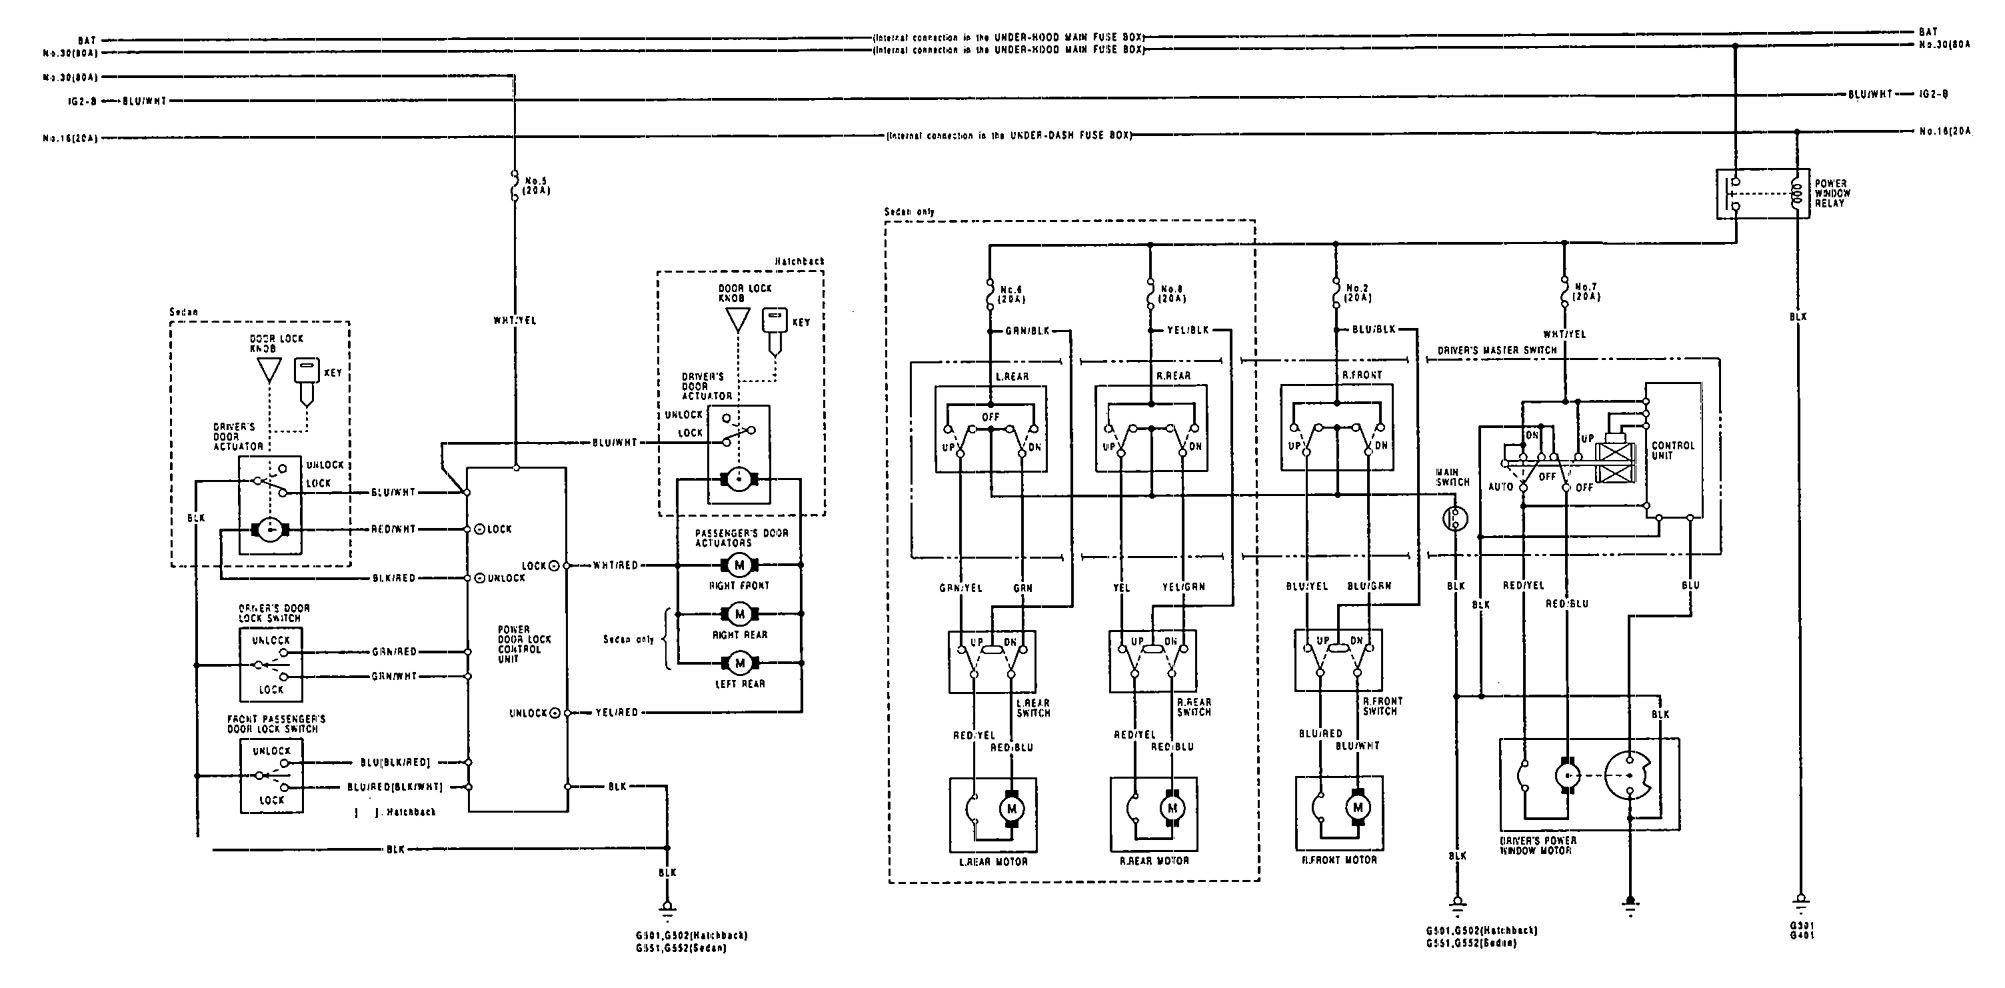 Wiring Diagram 1992 Acura Integra Diagrams Legend 1993 Power 1994 Engine Headlight